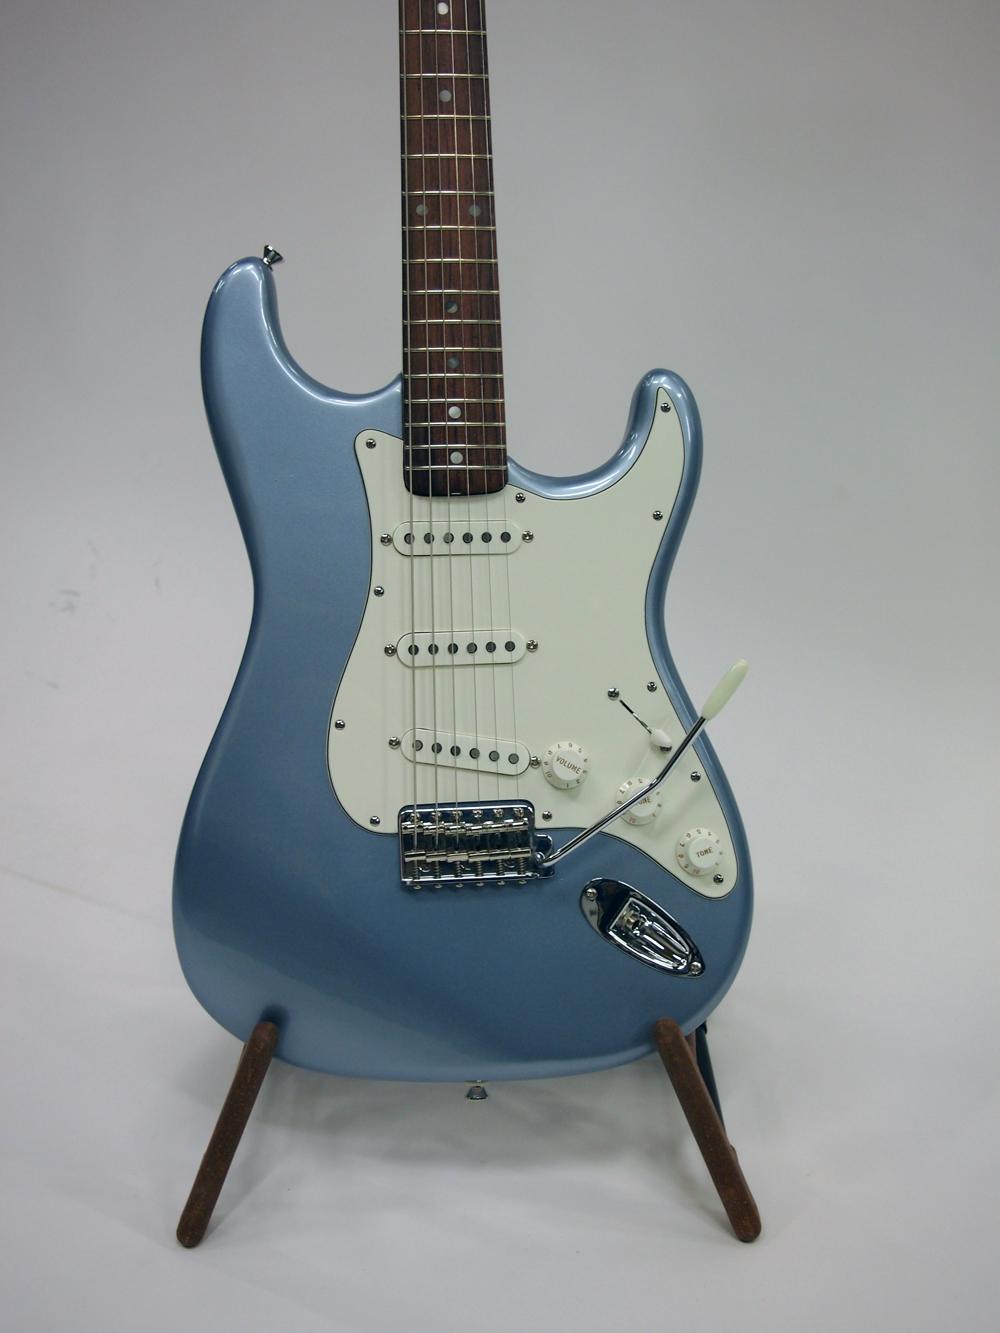 Ice Blue Metallic Vintage Guitar